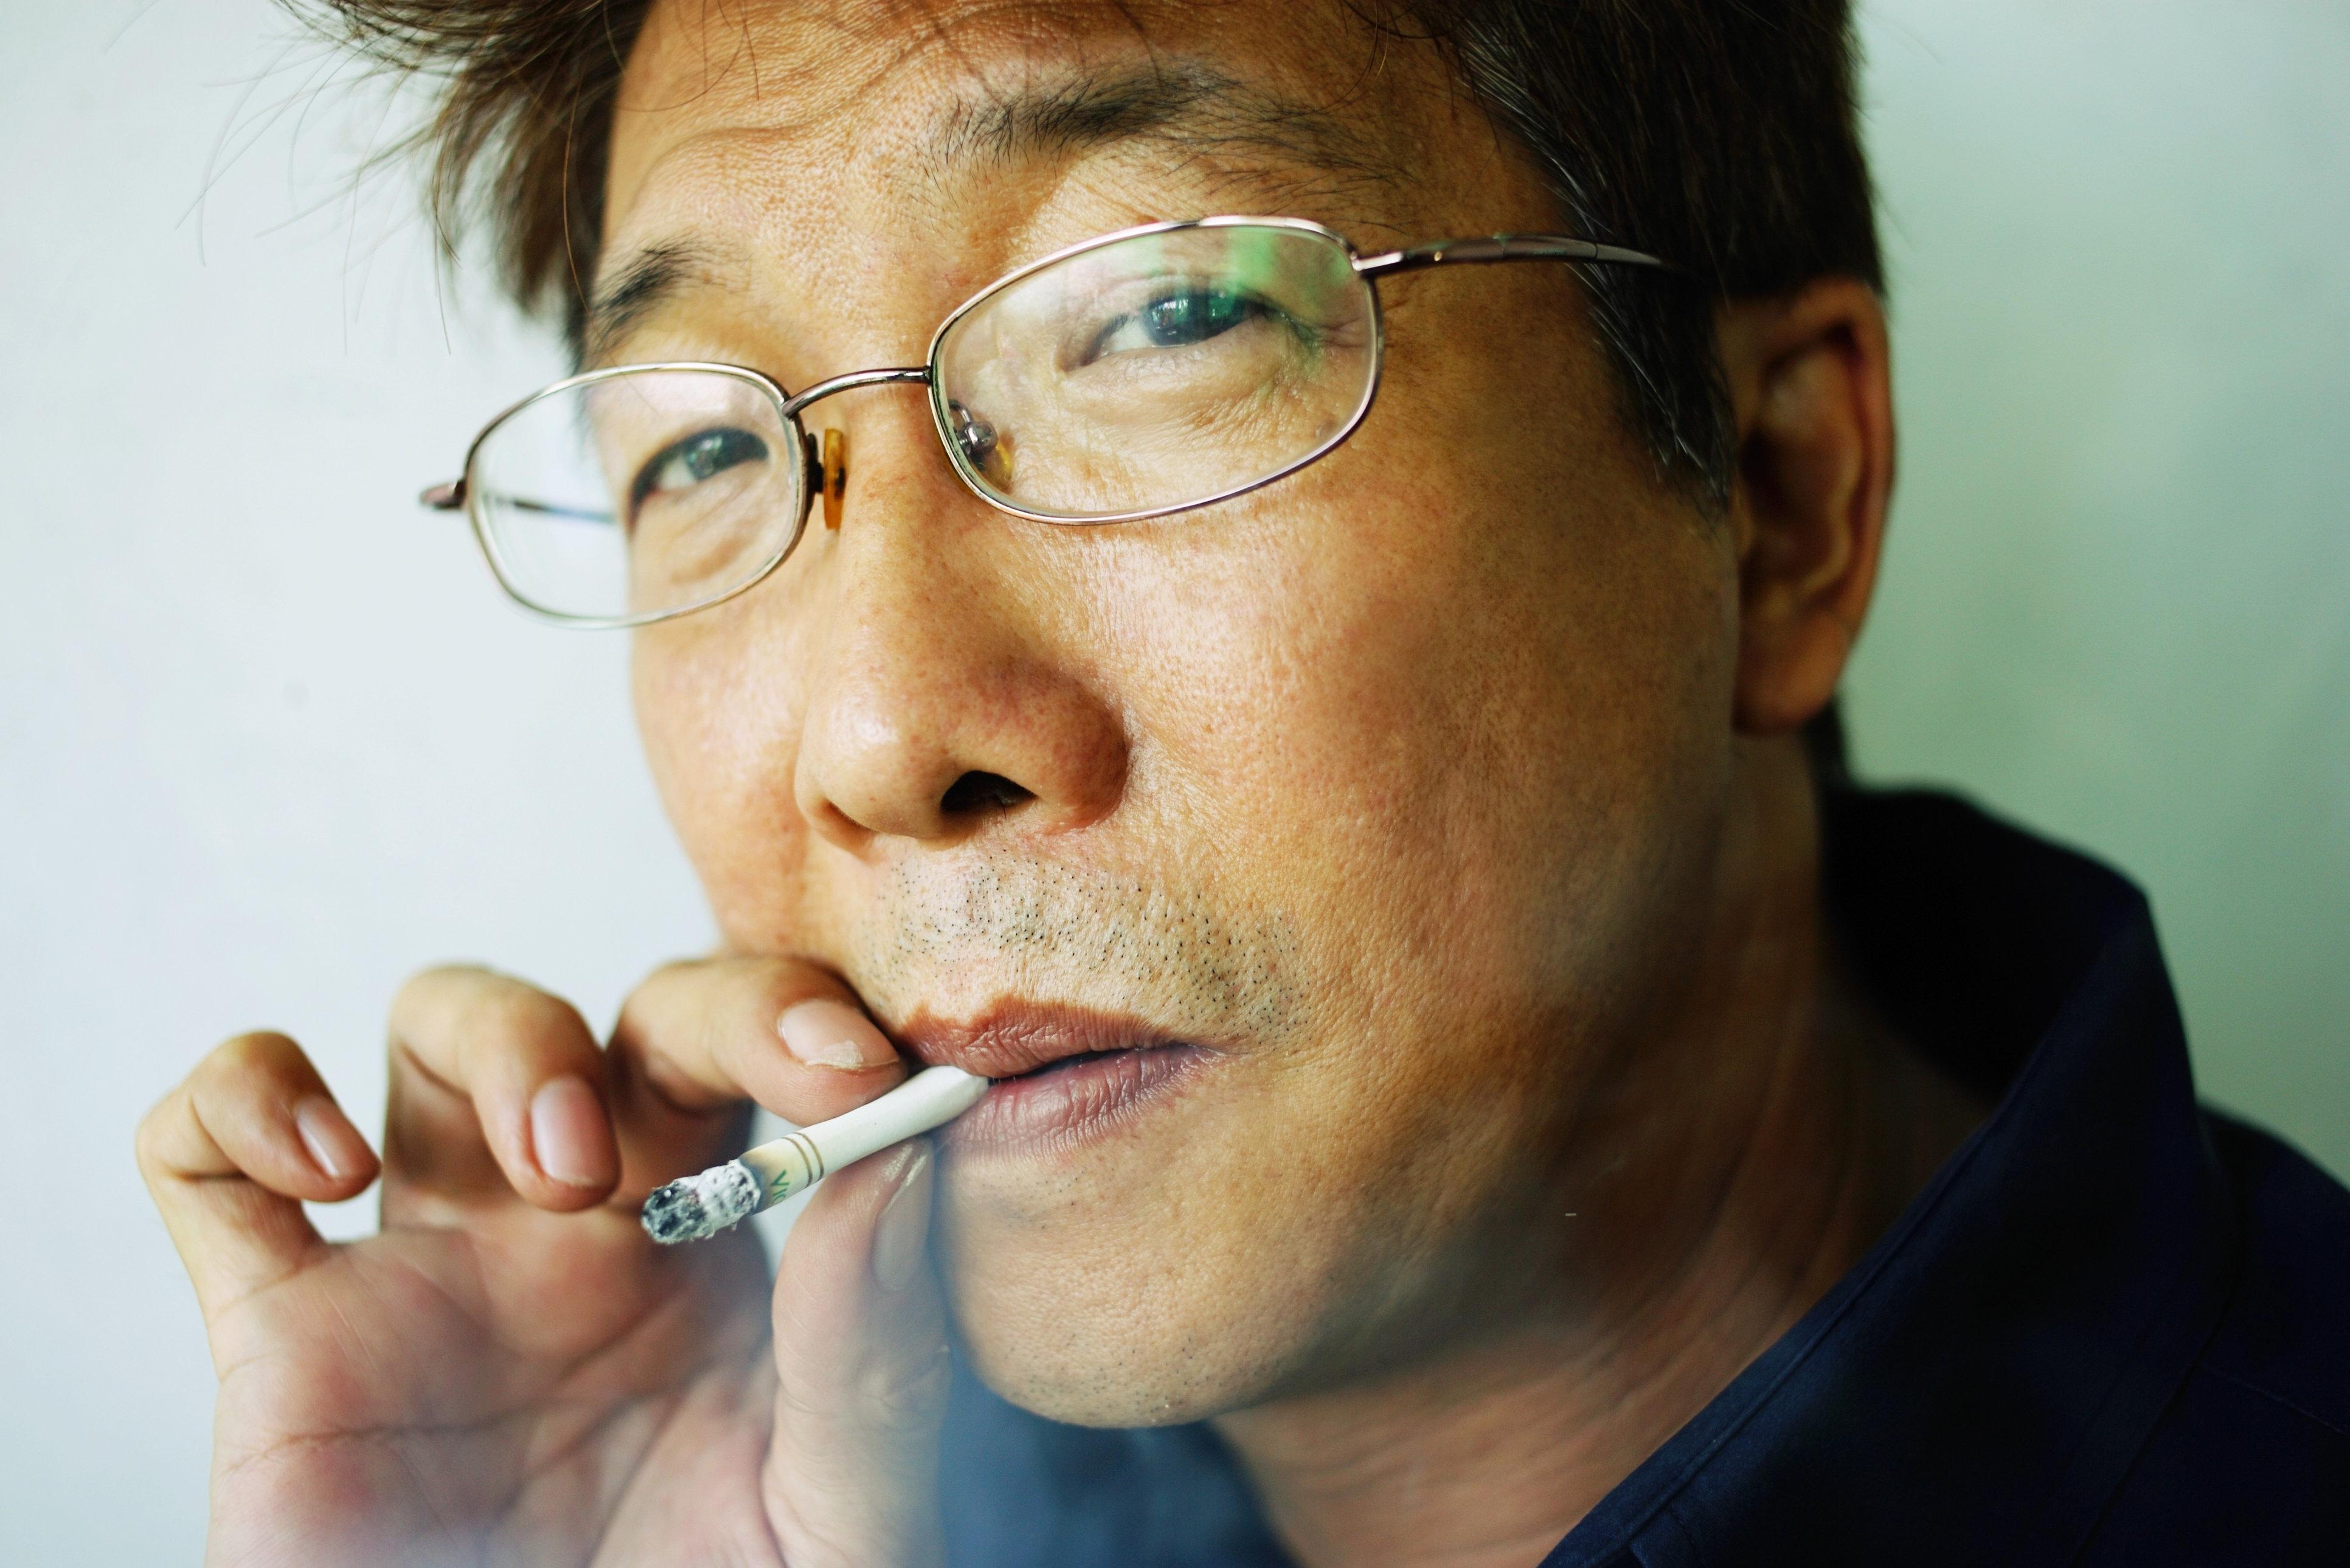 Man smoking cigarette, headshot